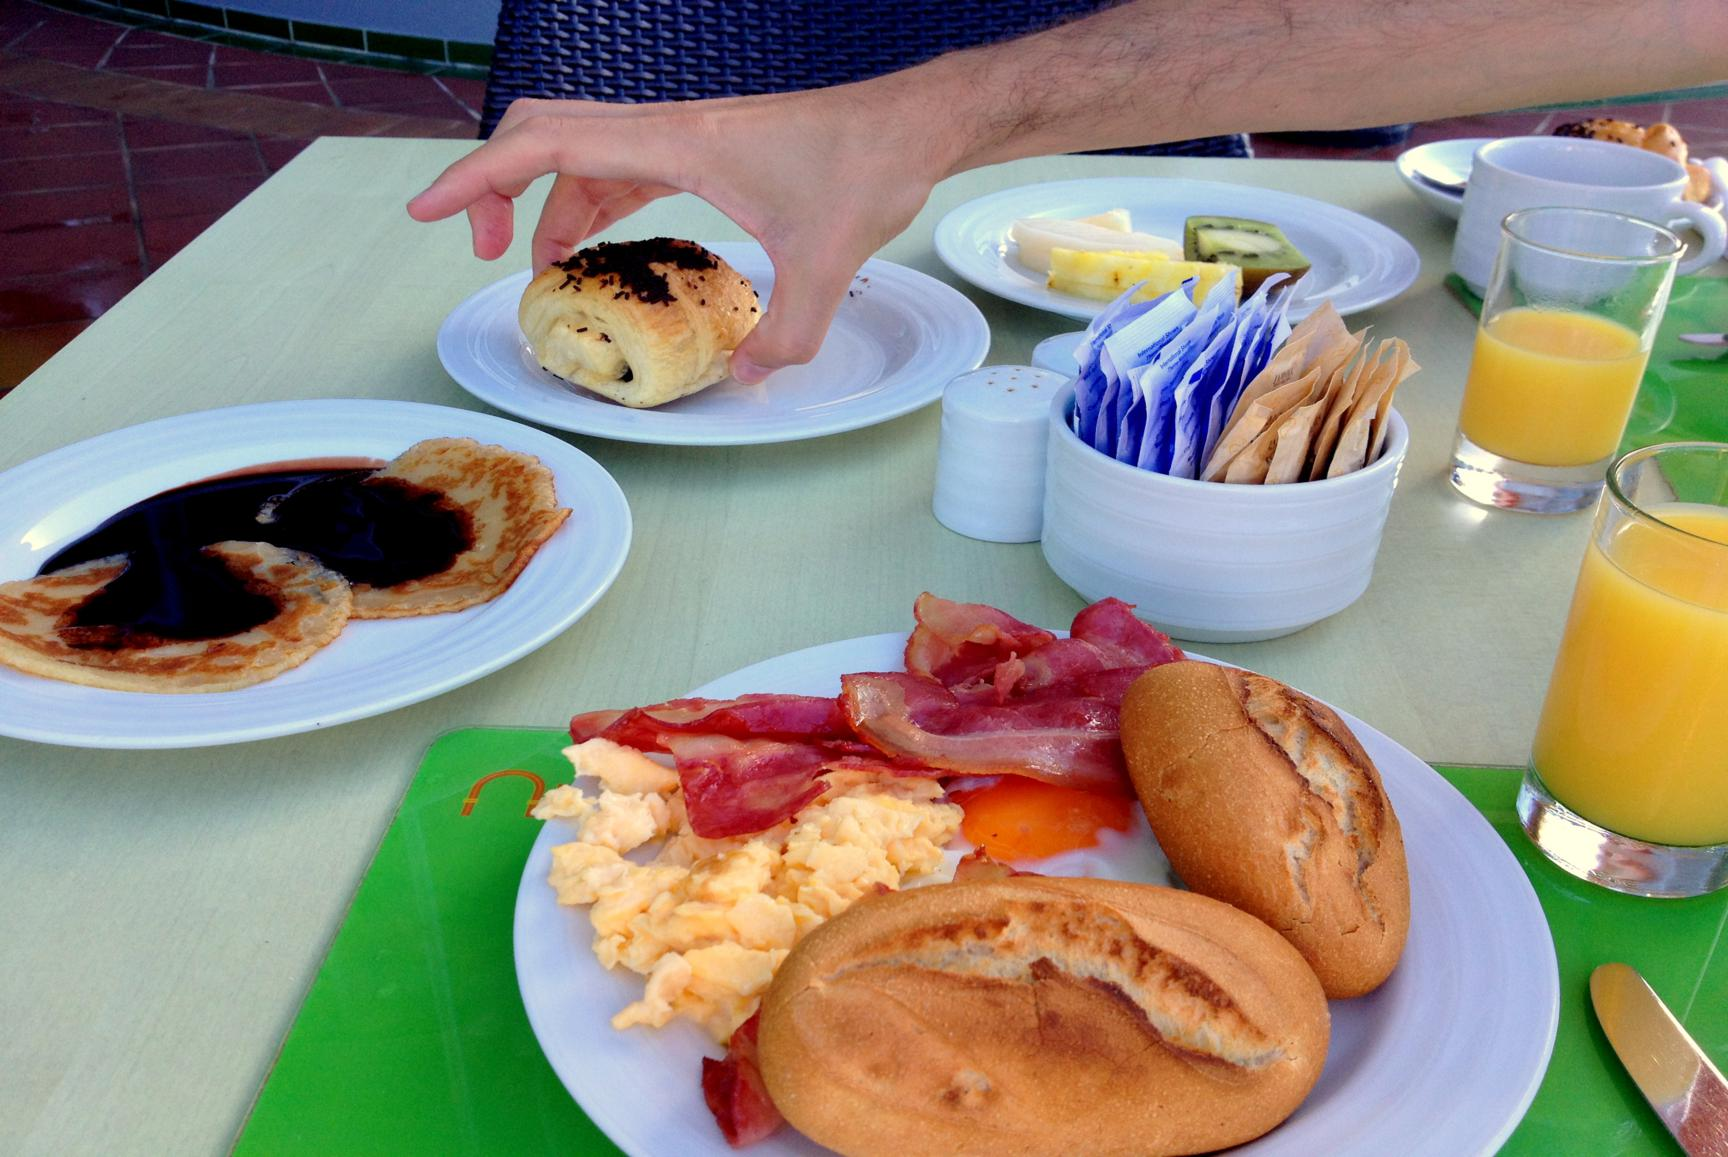 pestana carlton_desayuno